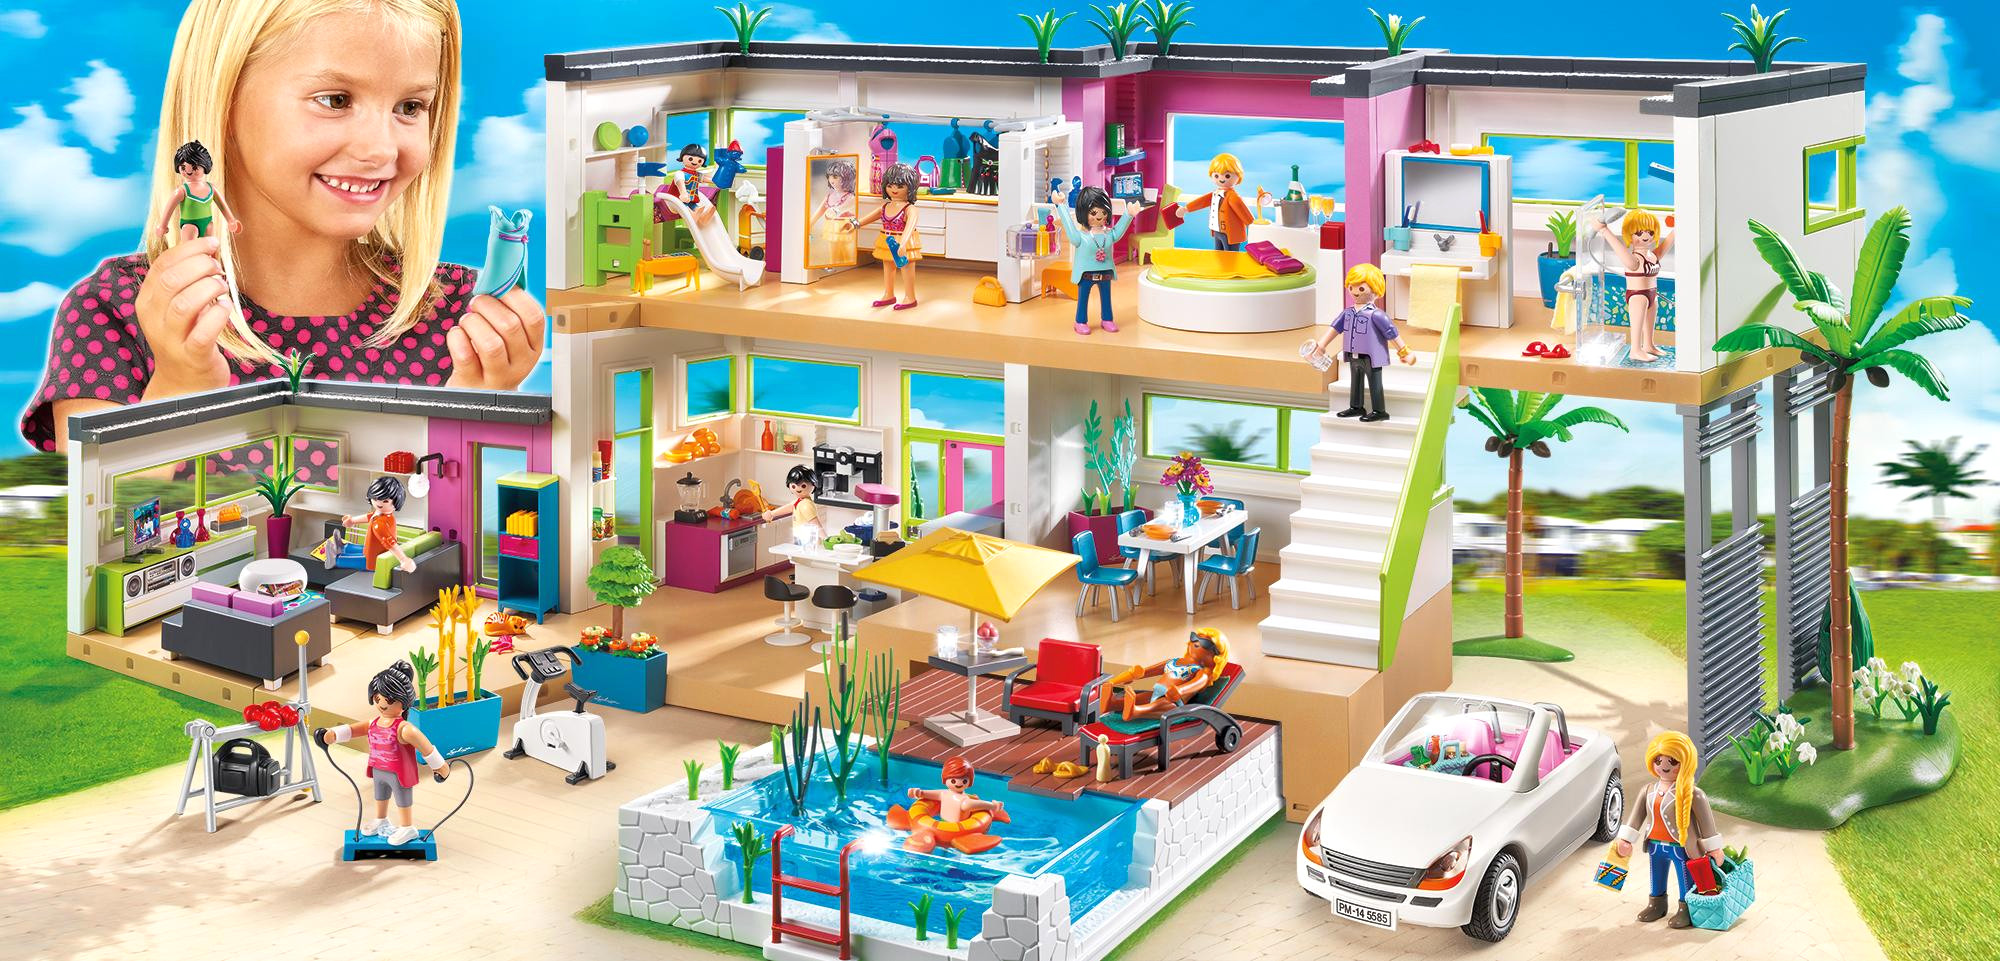 Maison Moderne De Playmobil